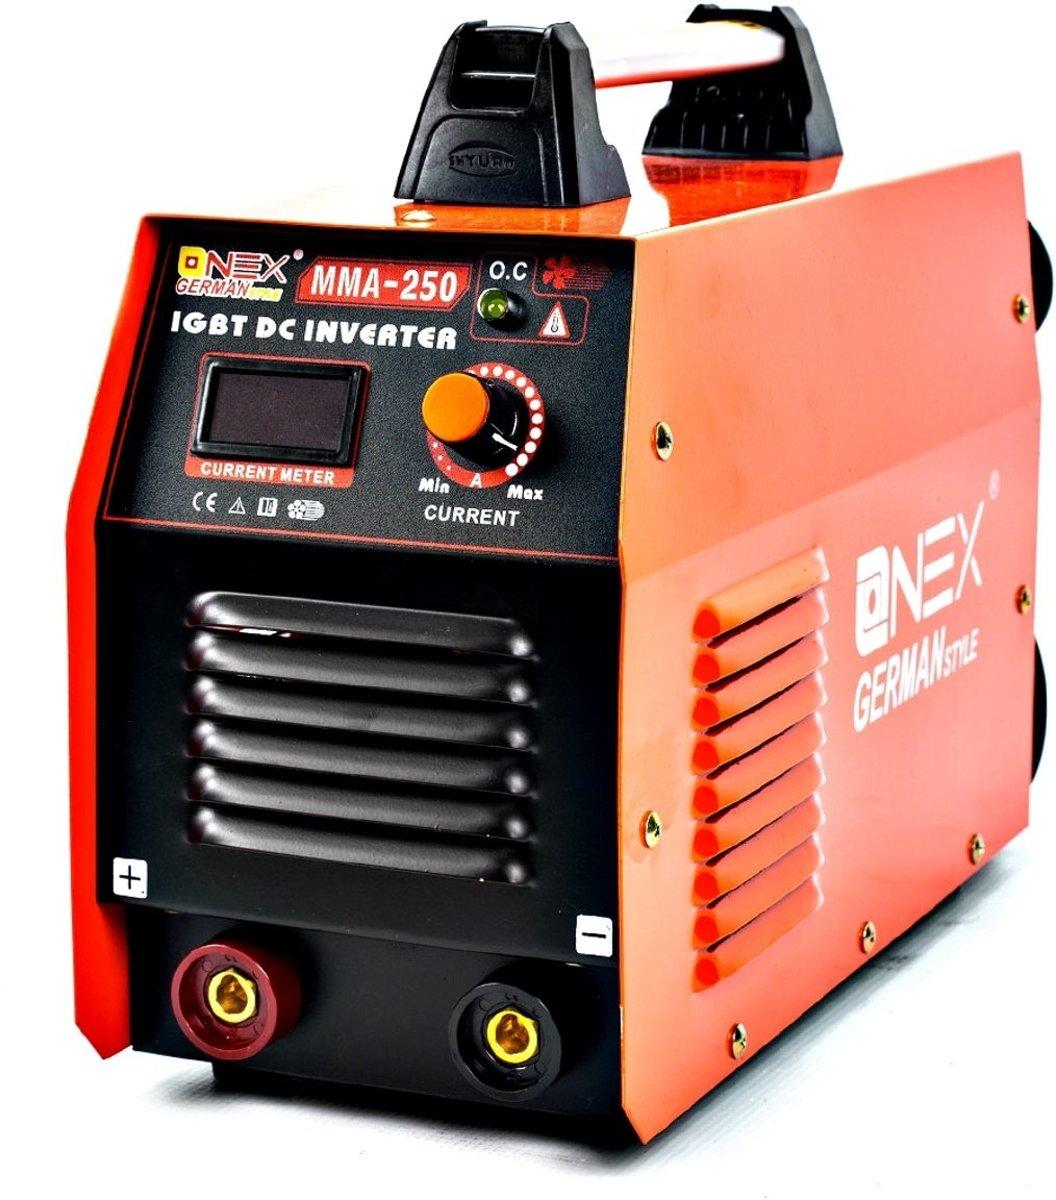 ONEX OX-3010 Lasapparaat / lasmachine 250 A MMA/IGBT - Incl. Laskap, bikhamer en Borstel